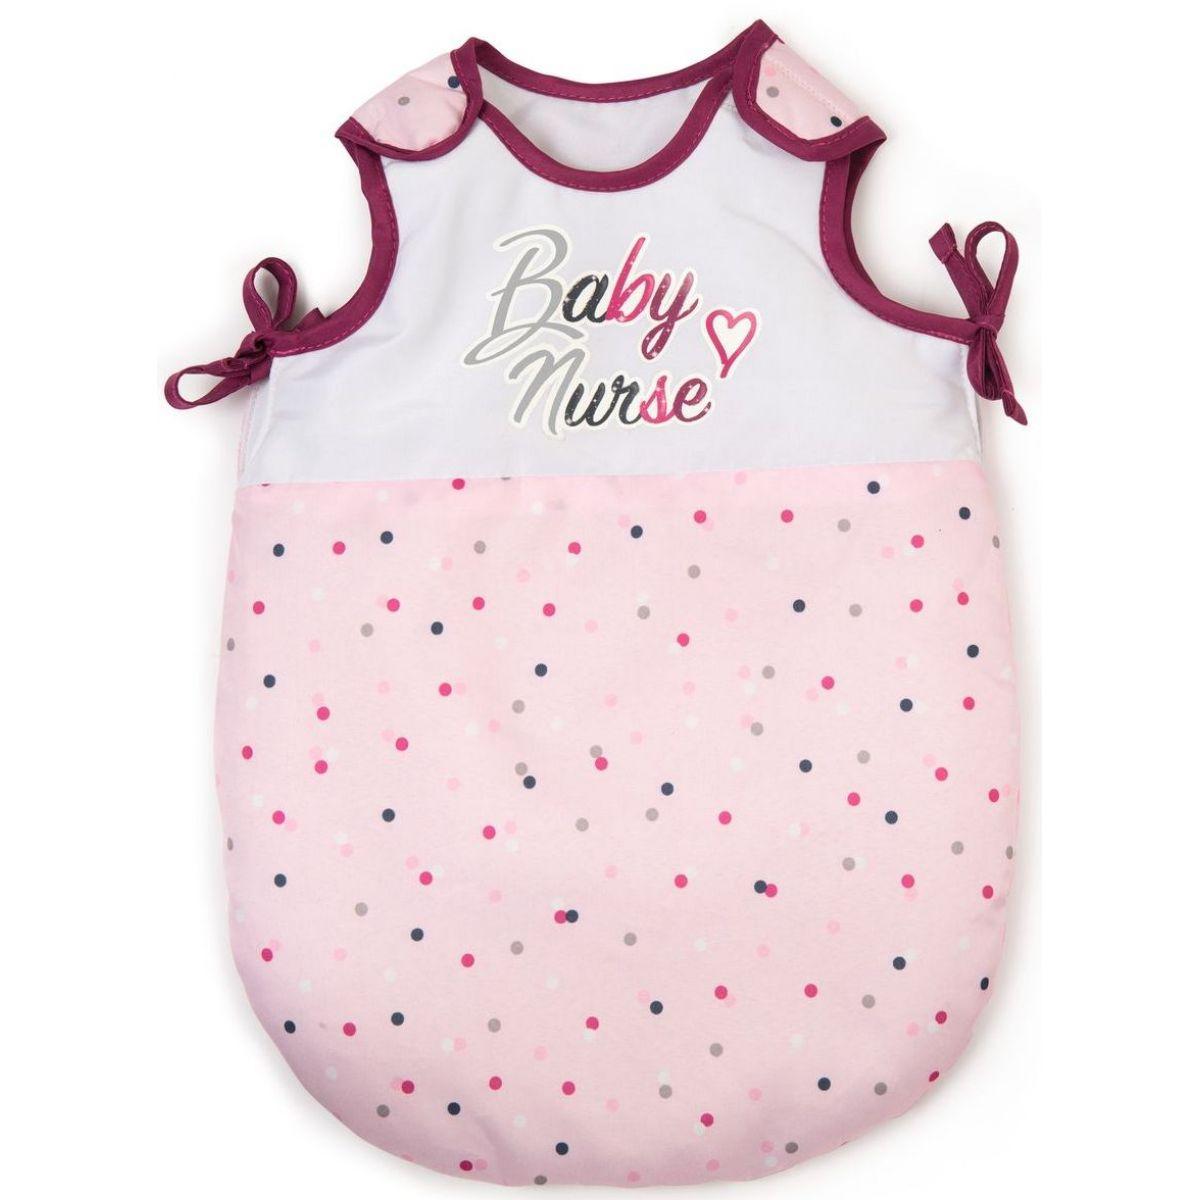 Smoby Baby Nurse Spací pytel pro panenky suchý zip